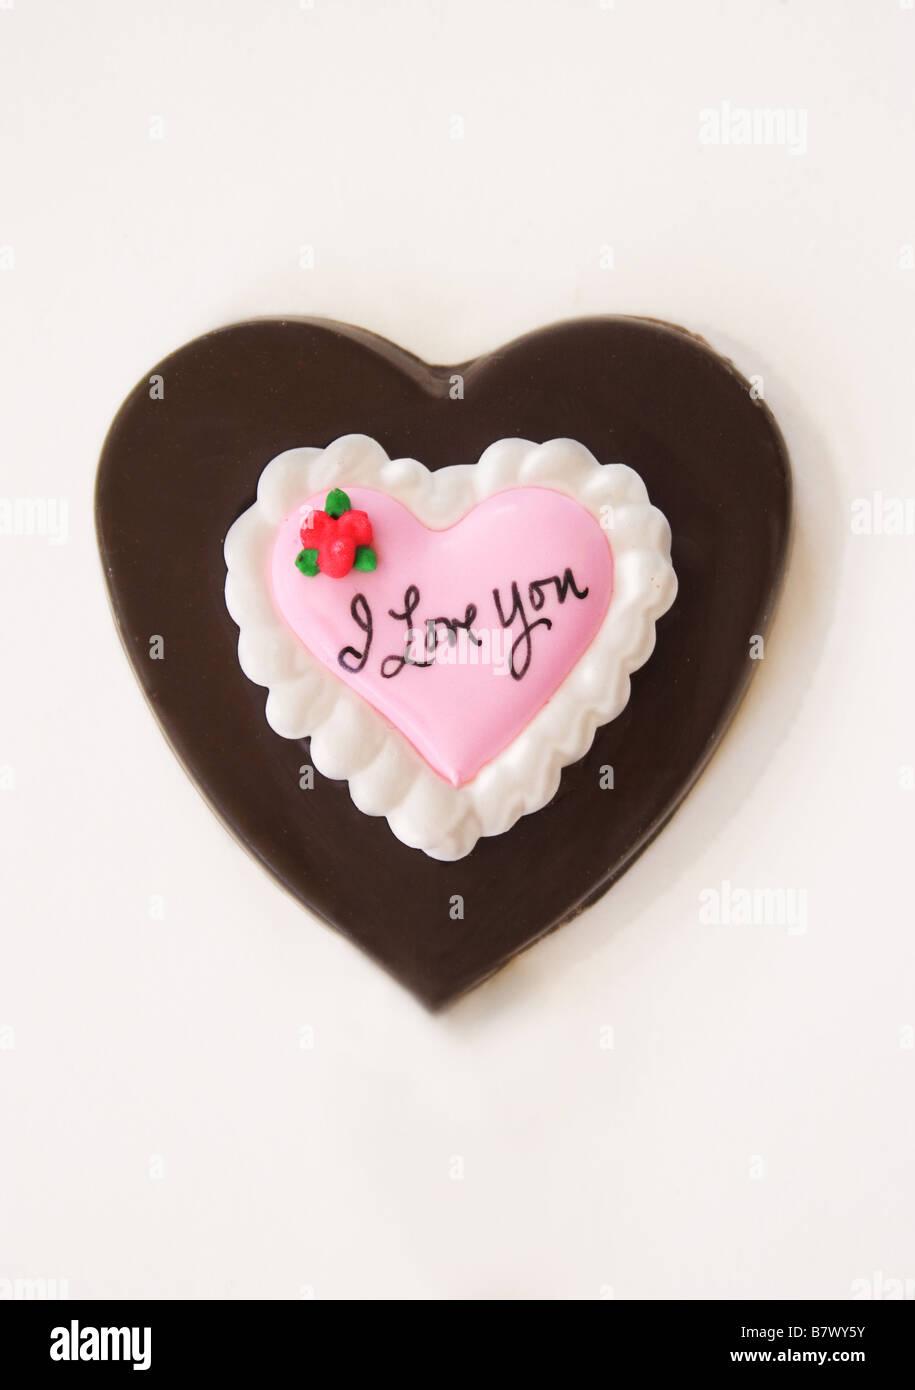 Chocolat saint valentin coeur sur un fond blanc. Photo Stock